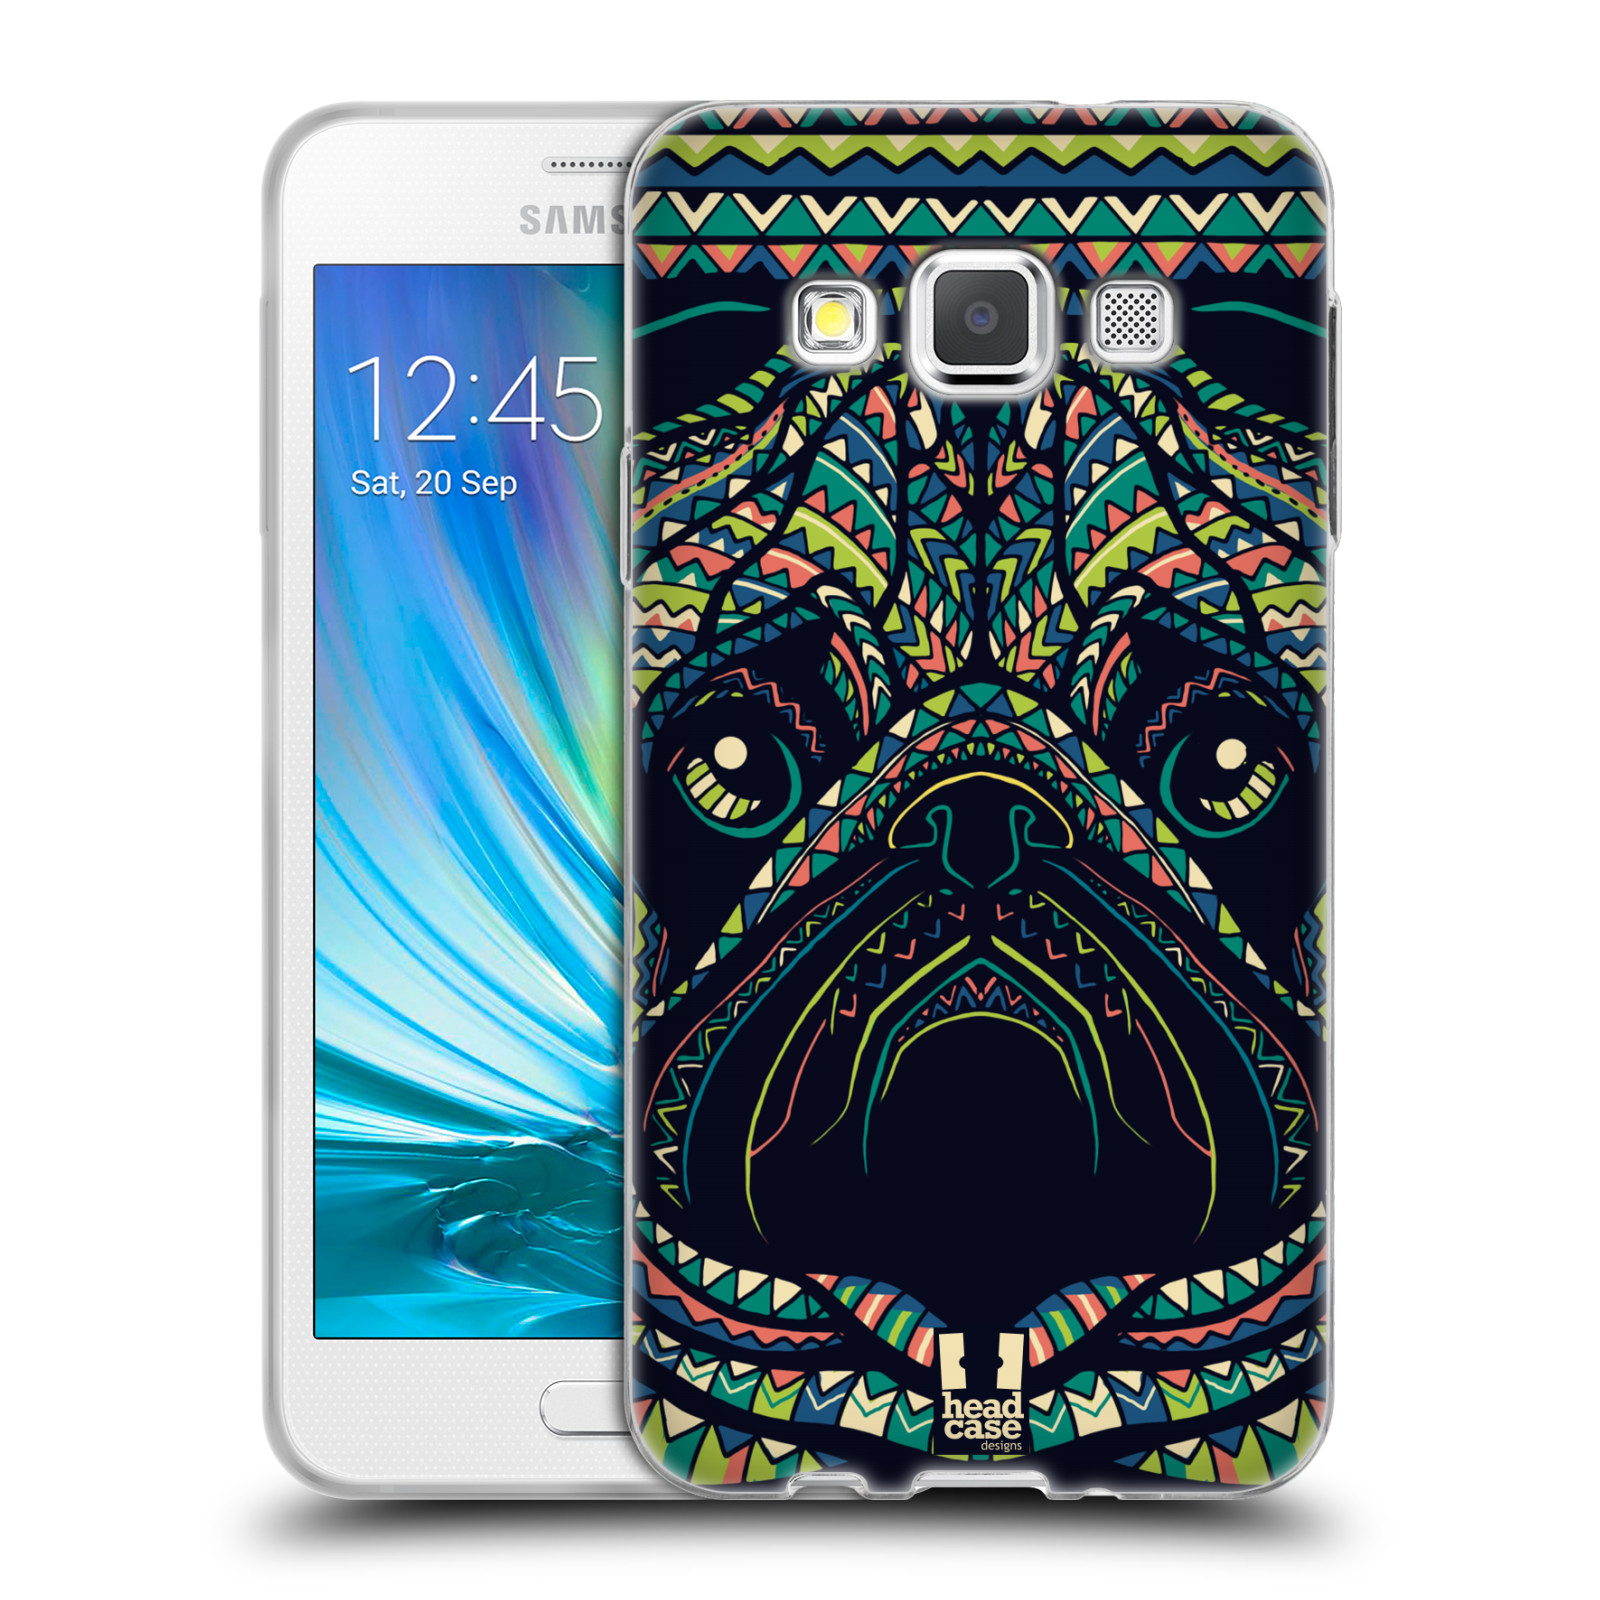 HEAD CASE silikonový obal na mobil Samsung Galaxy A3 vzor Aztécký motiv zvíře 3 mopsík